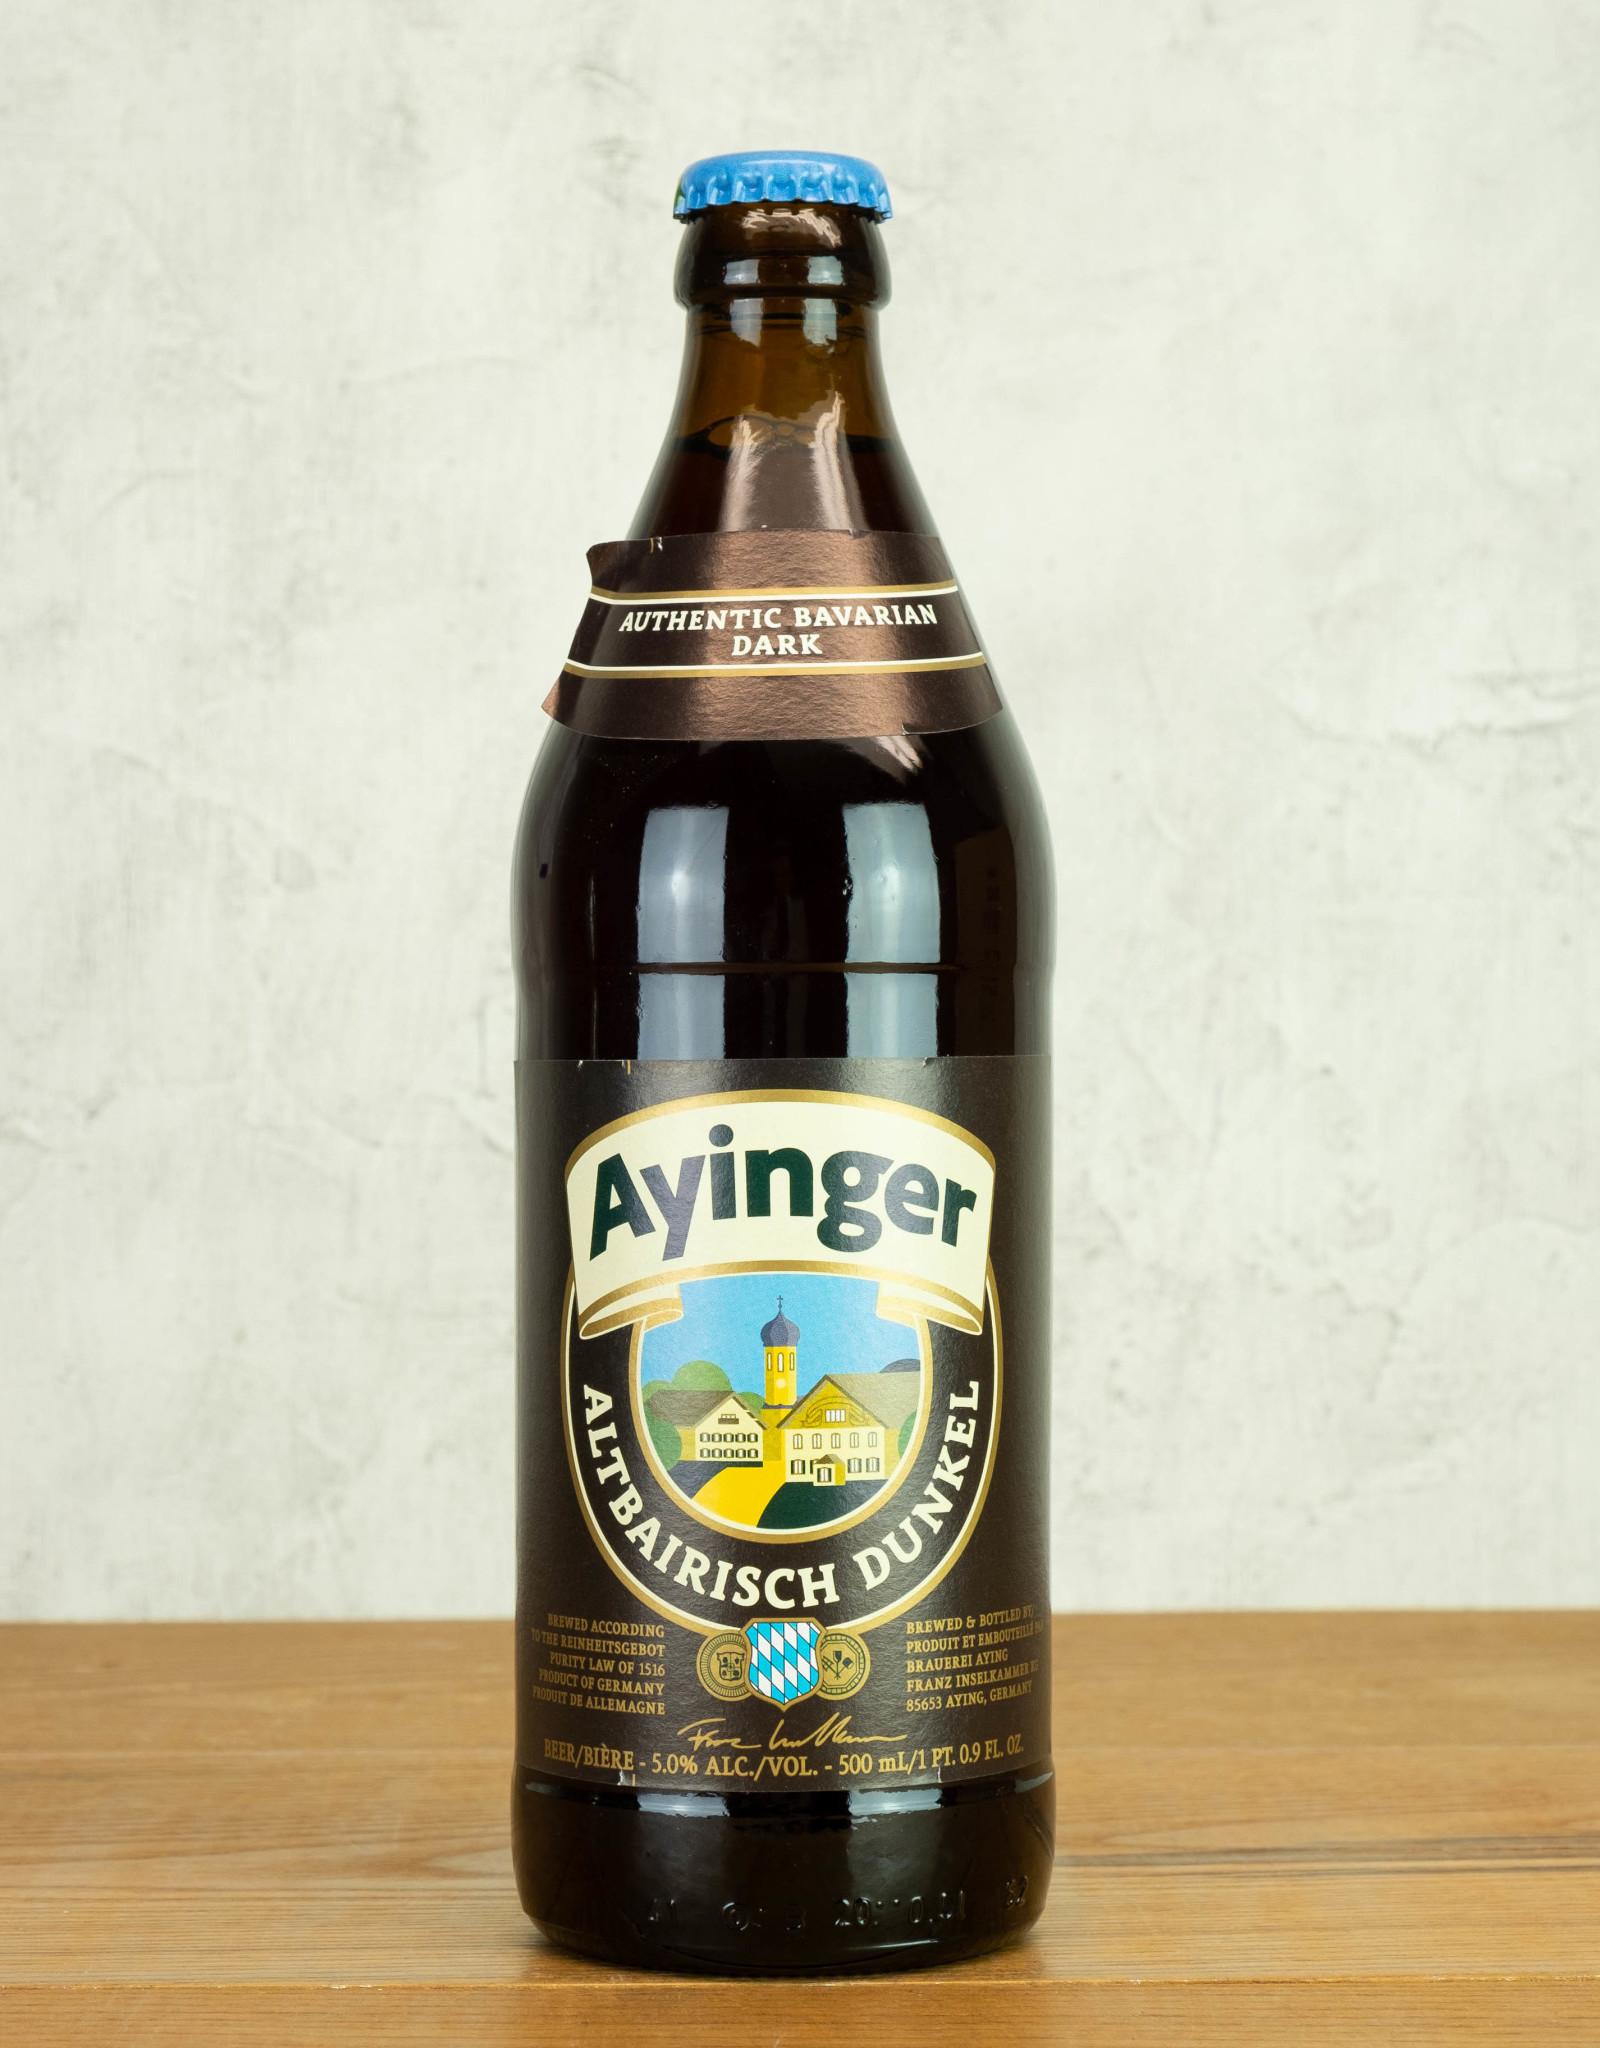 Ayinger Altbairisch Dunkel Single